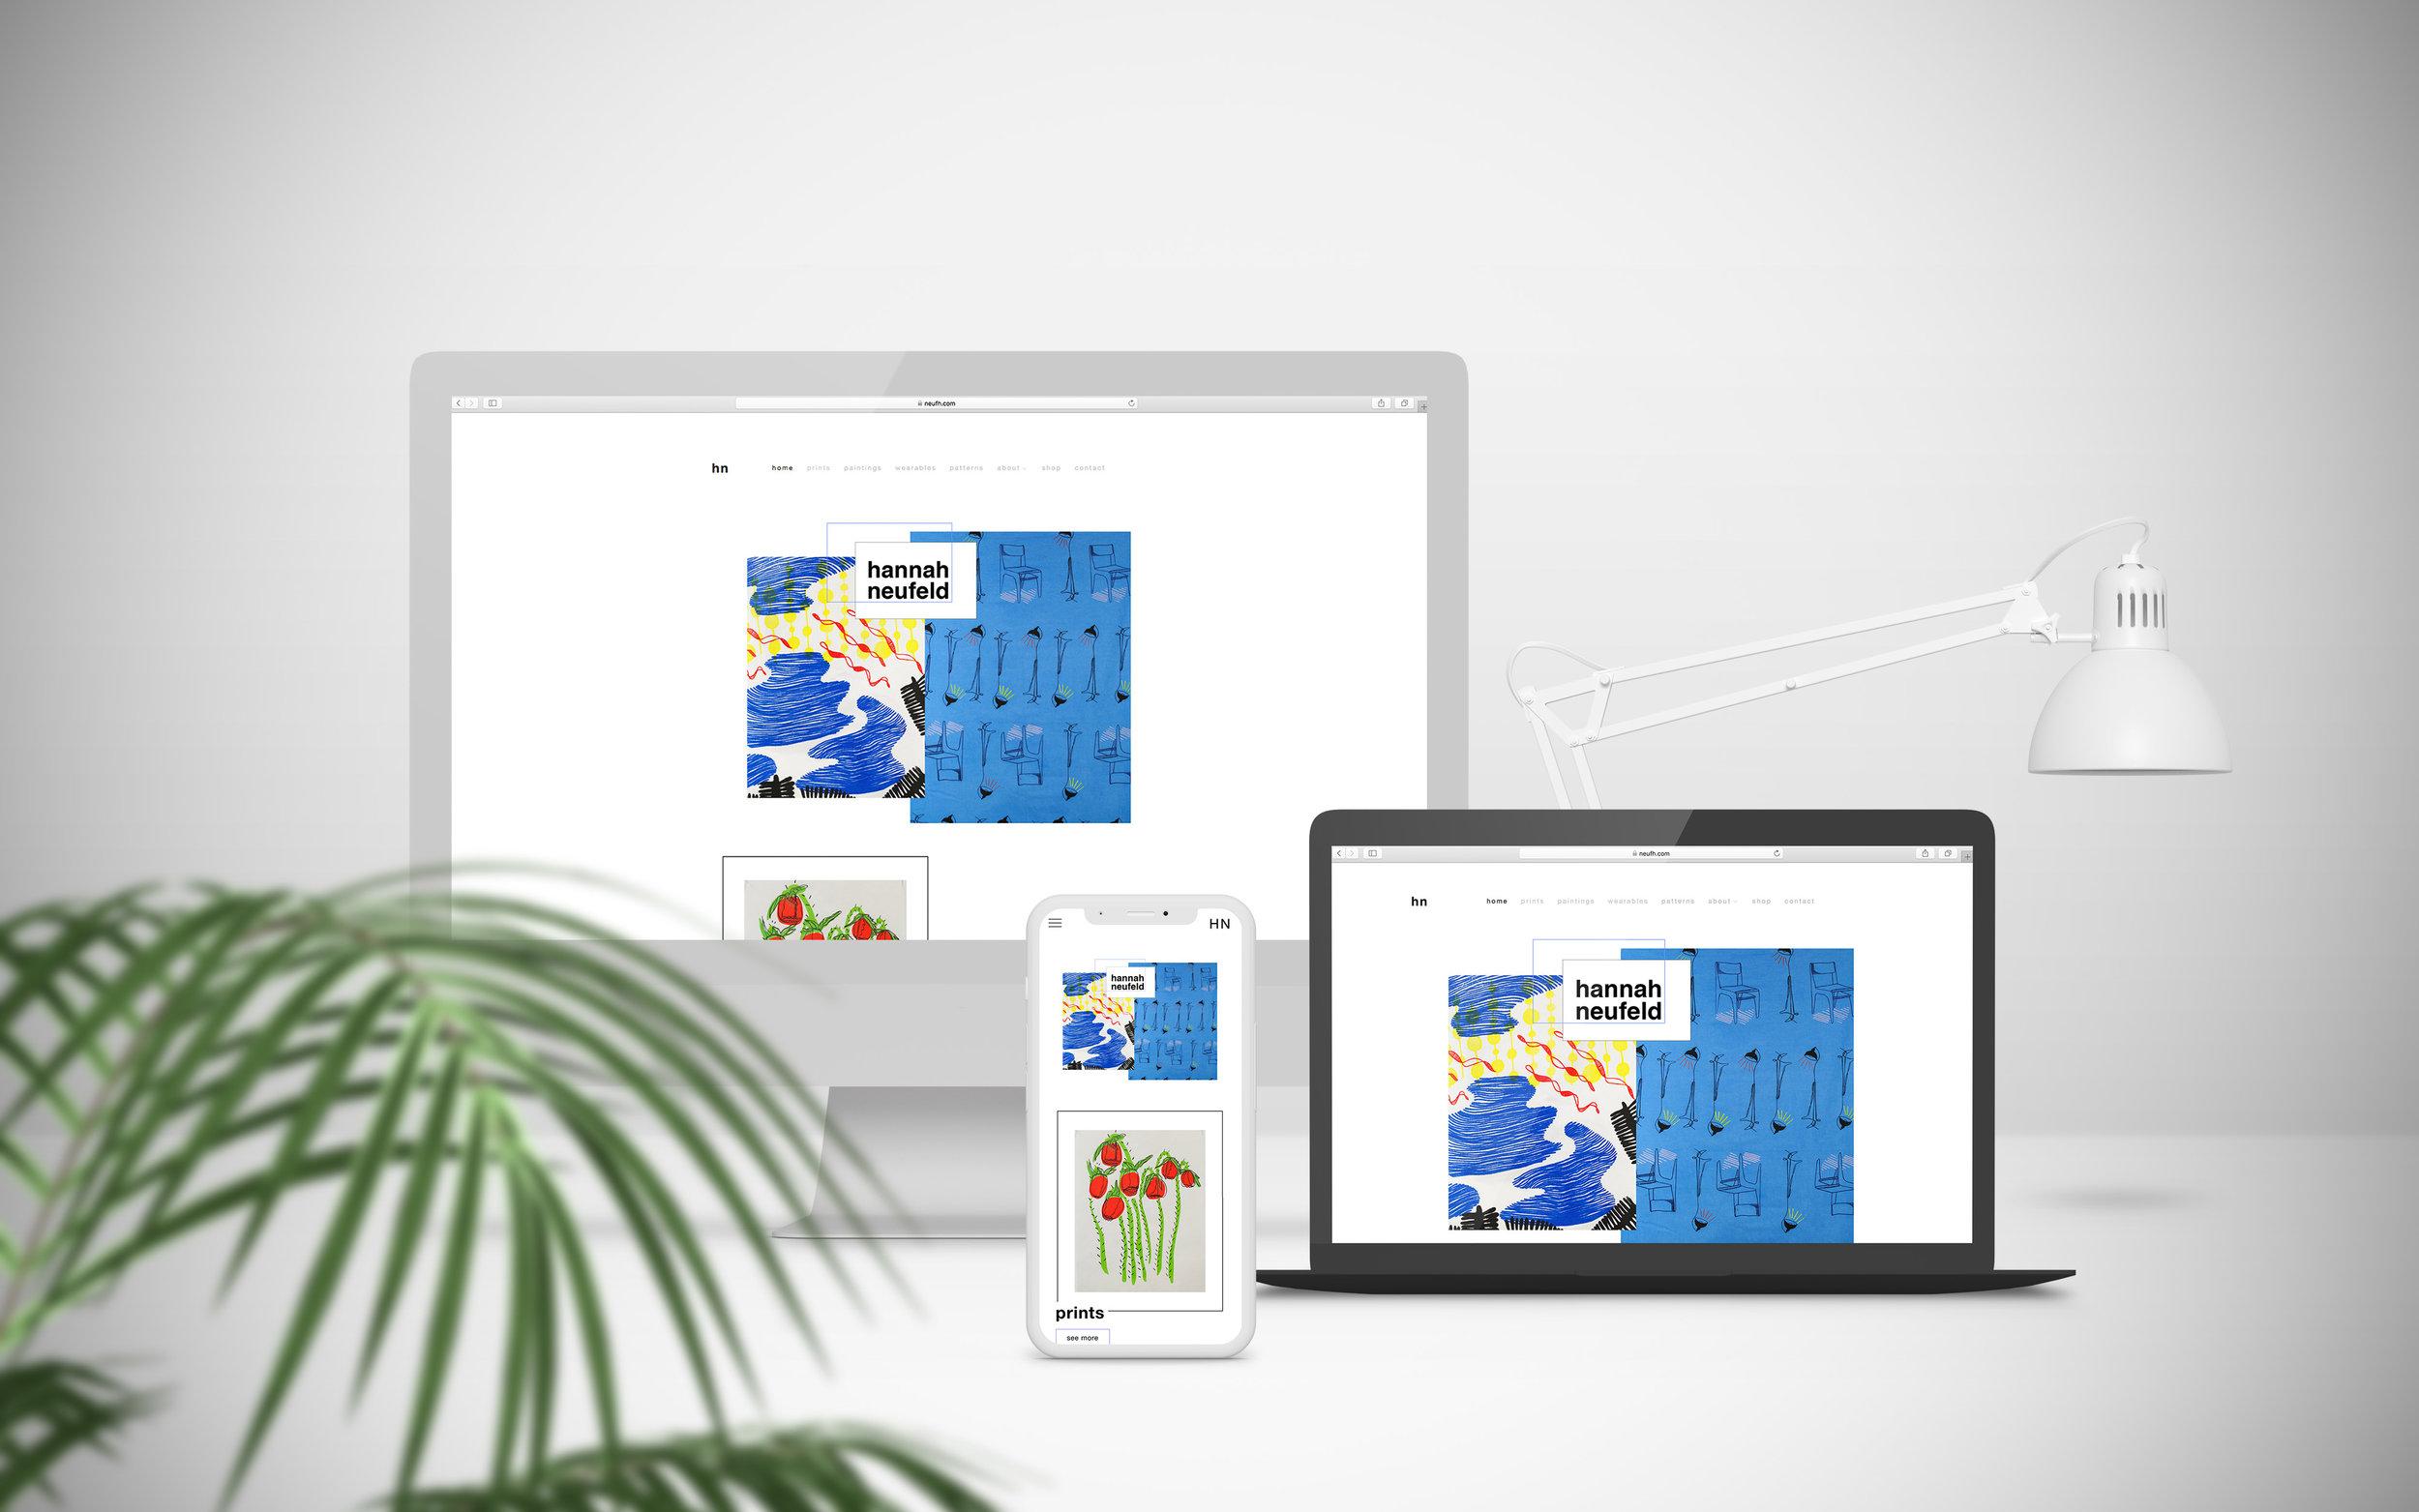 hnwebsite_mockup.jpg